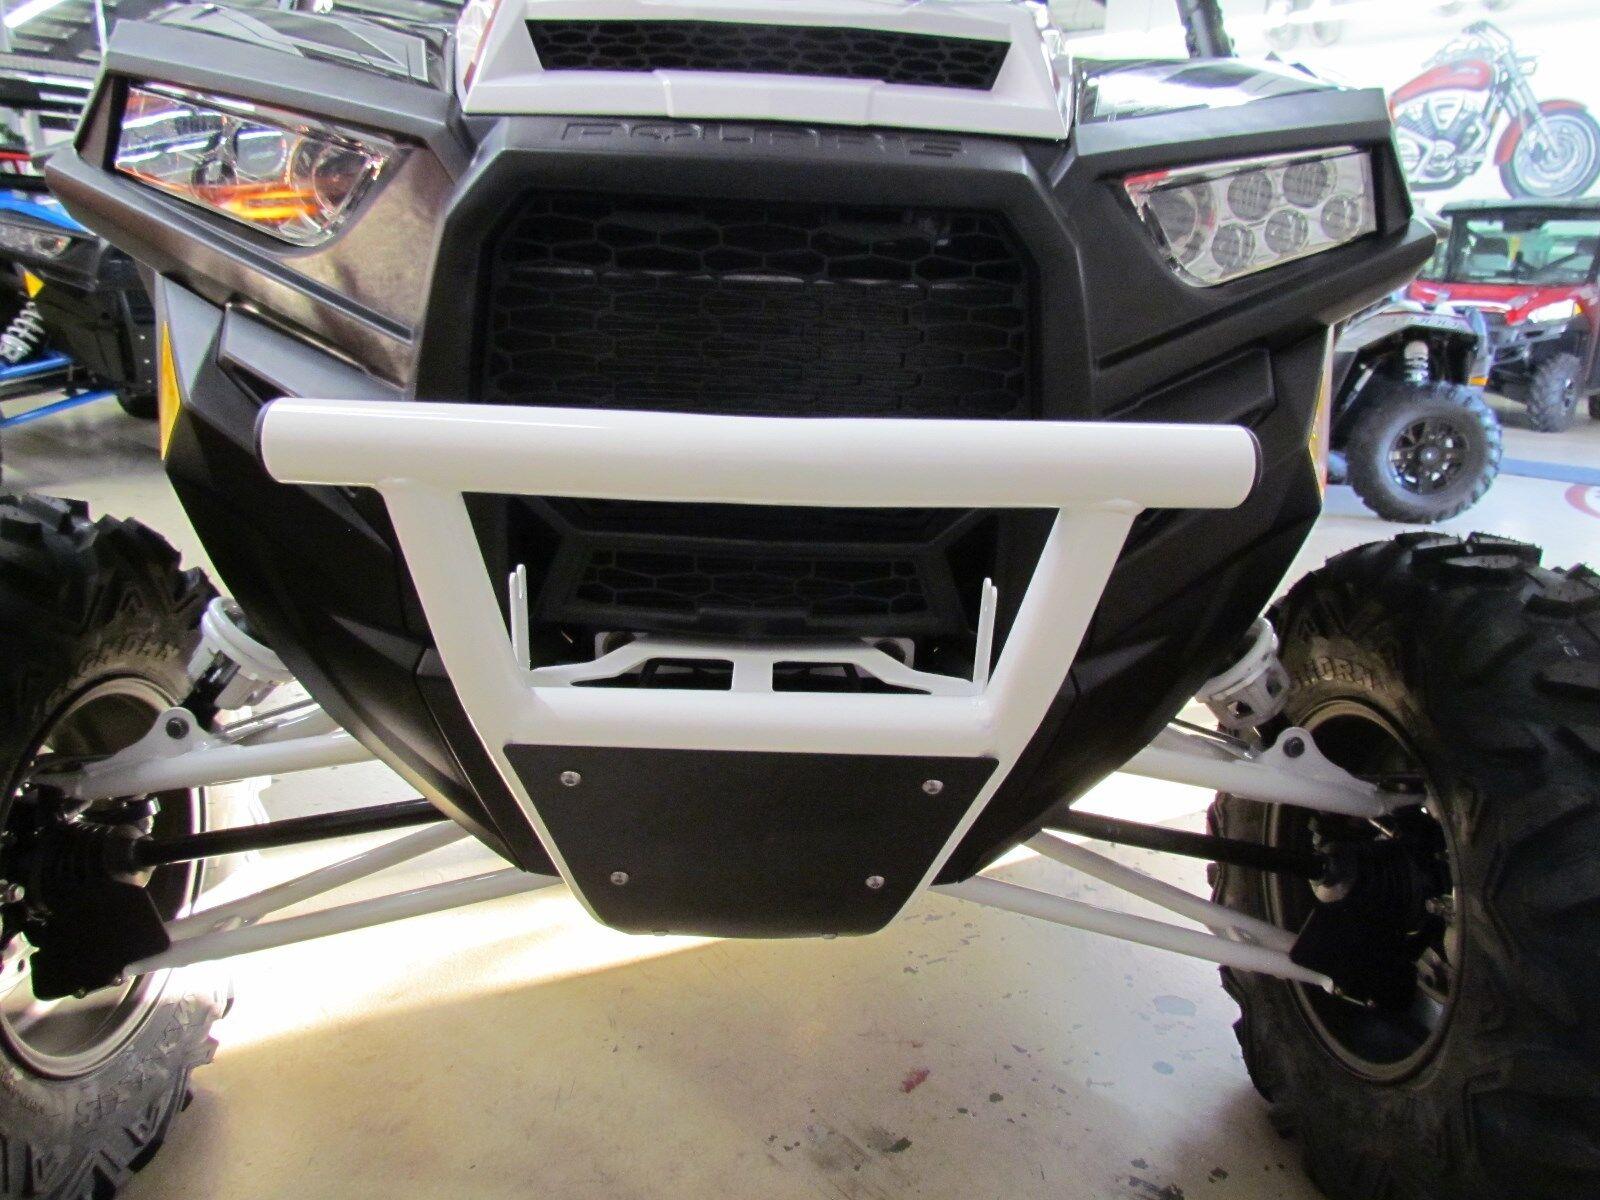 Polaris RZR 2014-2018 XP/4 1000 900 Turbo WHITE Front  Bumper/Skid Plate